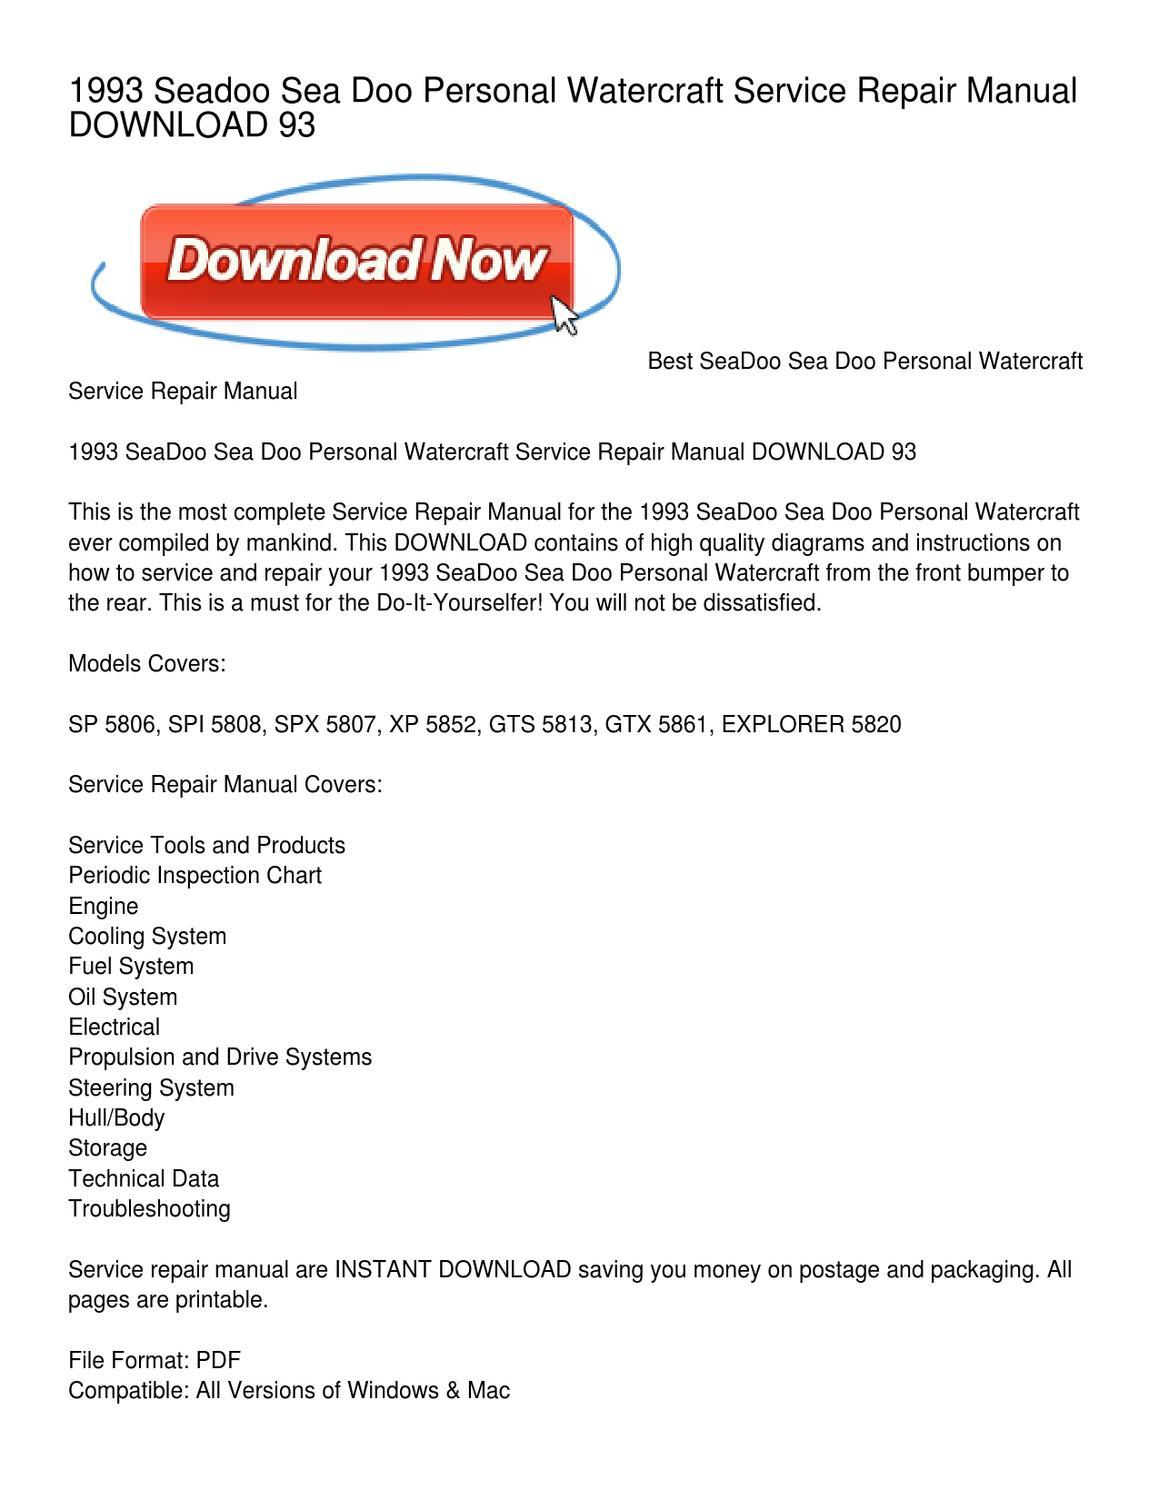 1993 Seadoo Sea Doo Personal Watercraft Service Repair Manual DOWNLOAD 93  by Phyllis Vasquez - issuu